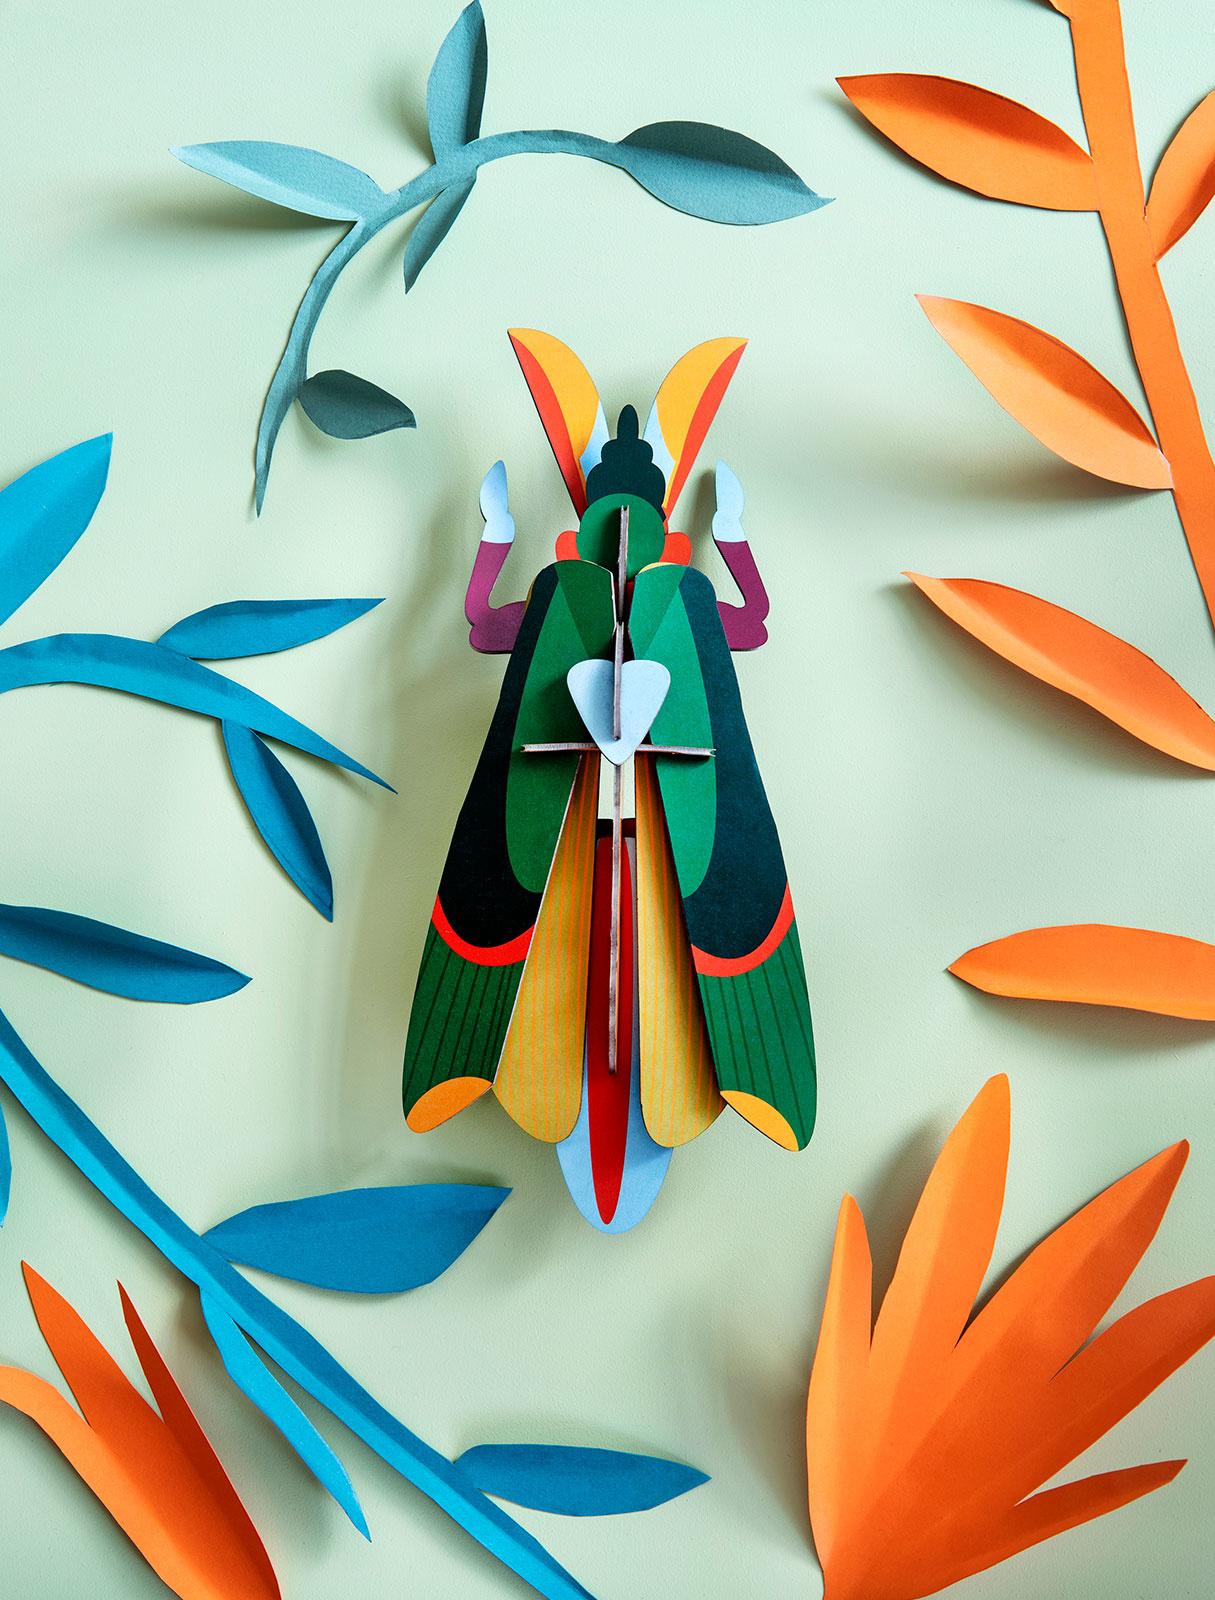 Studio Roof 3D Wanddecoratie Grasshopper